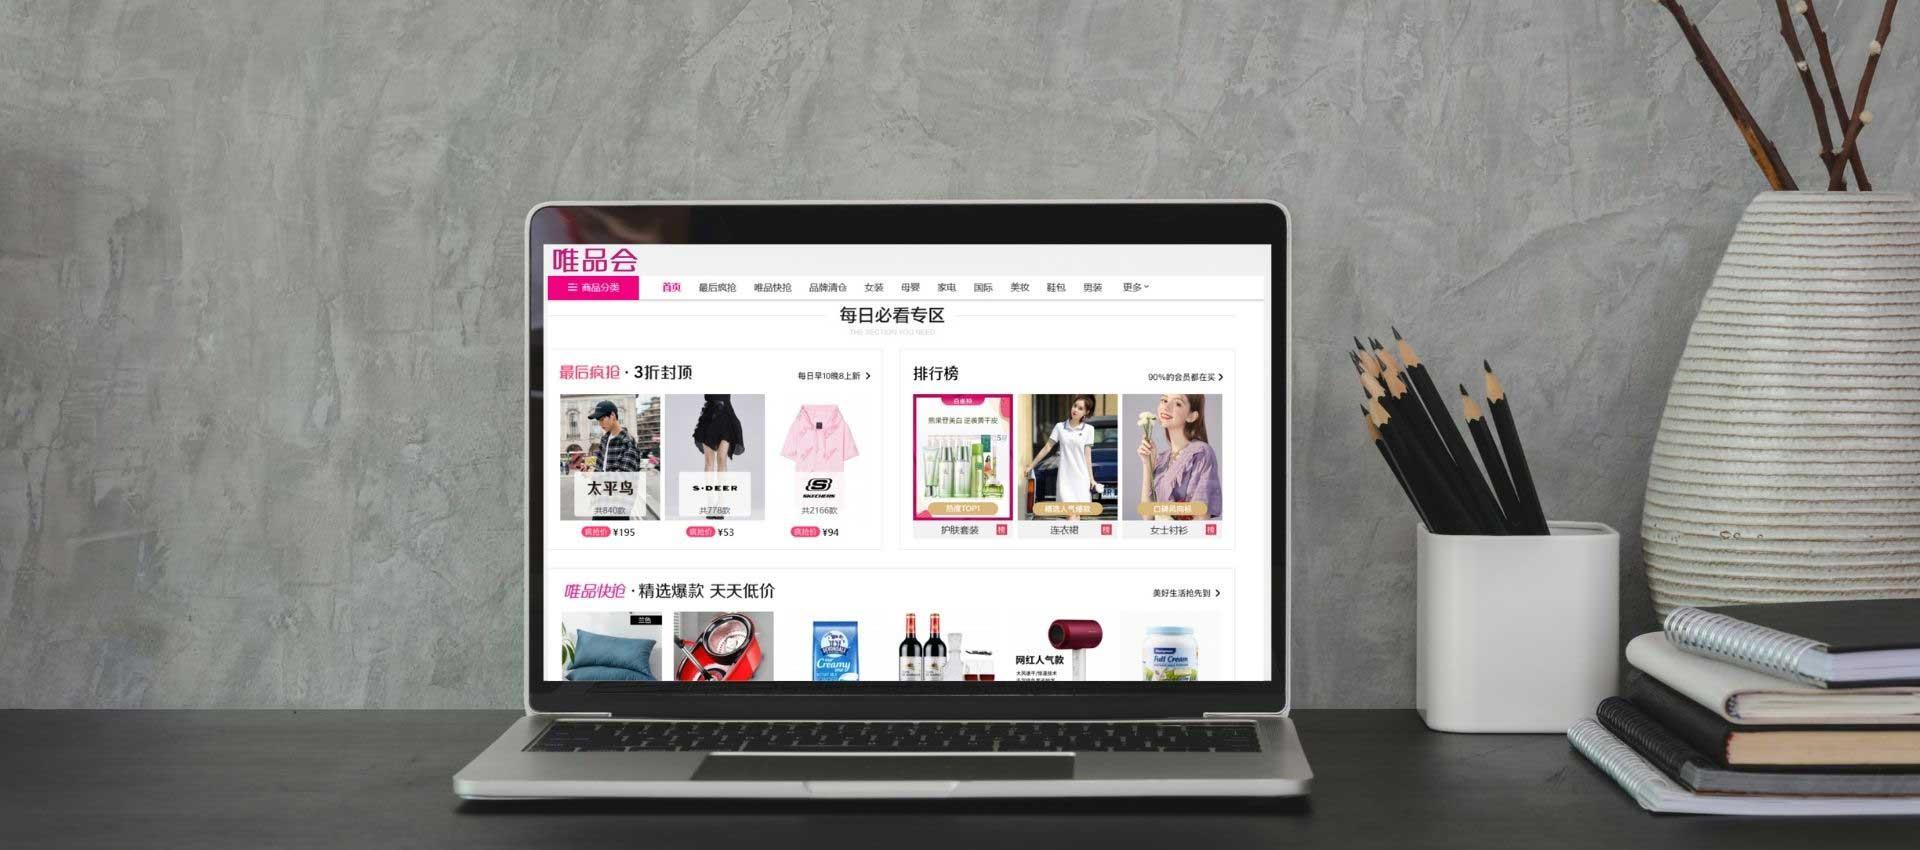 vip-store-ecommerce-banner